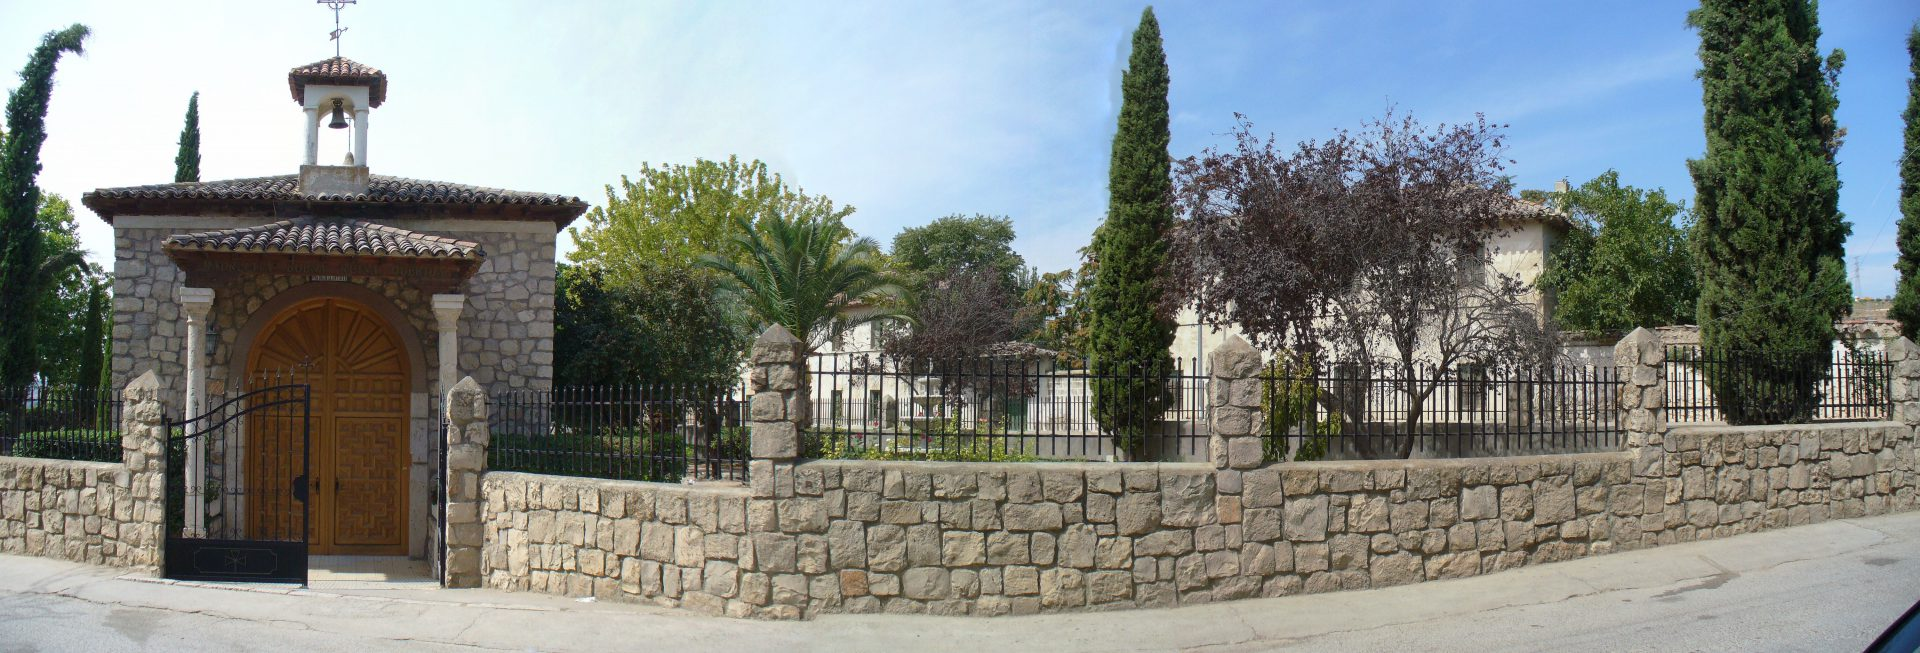 Fotos 360 Ermita de Morata de Tajuña. #VidePan por #Madrid